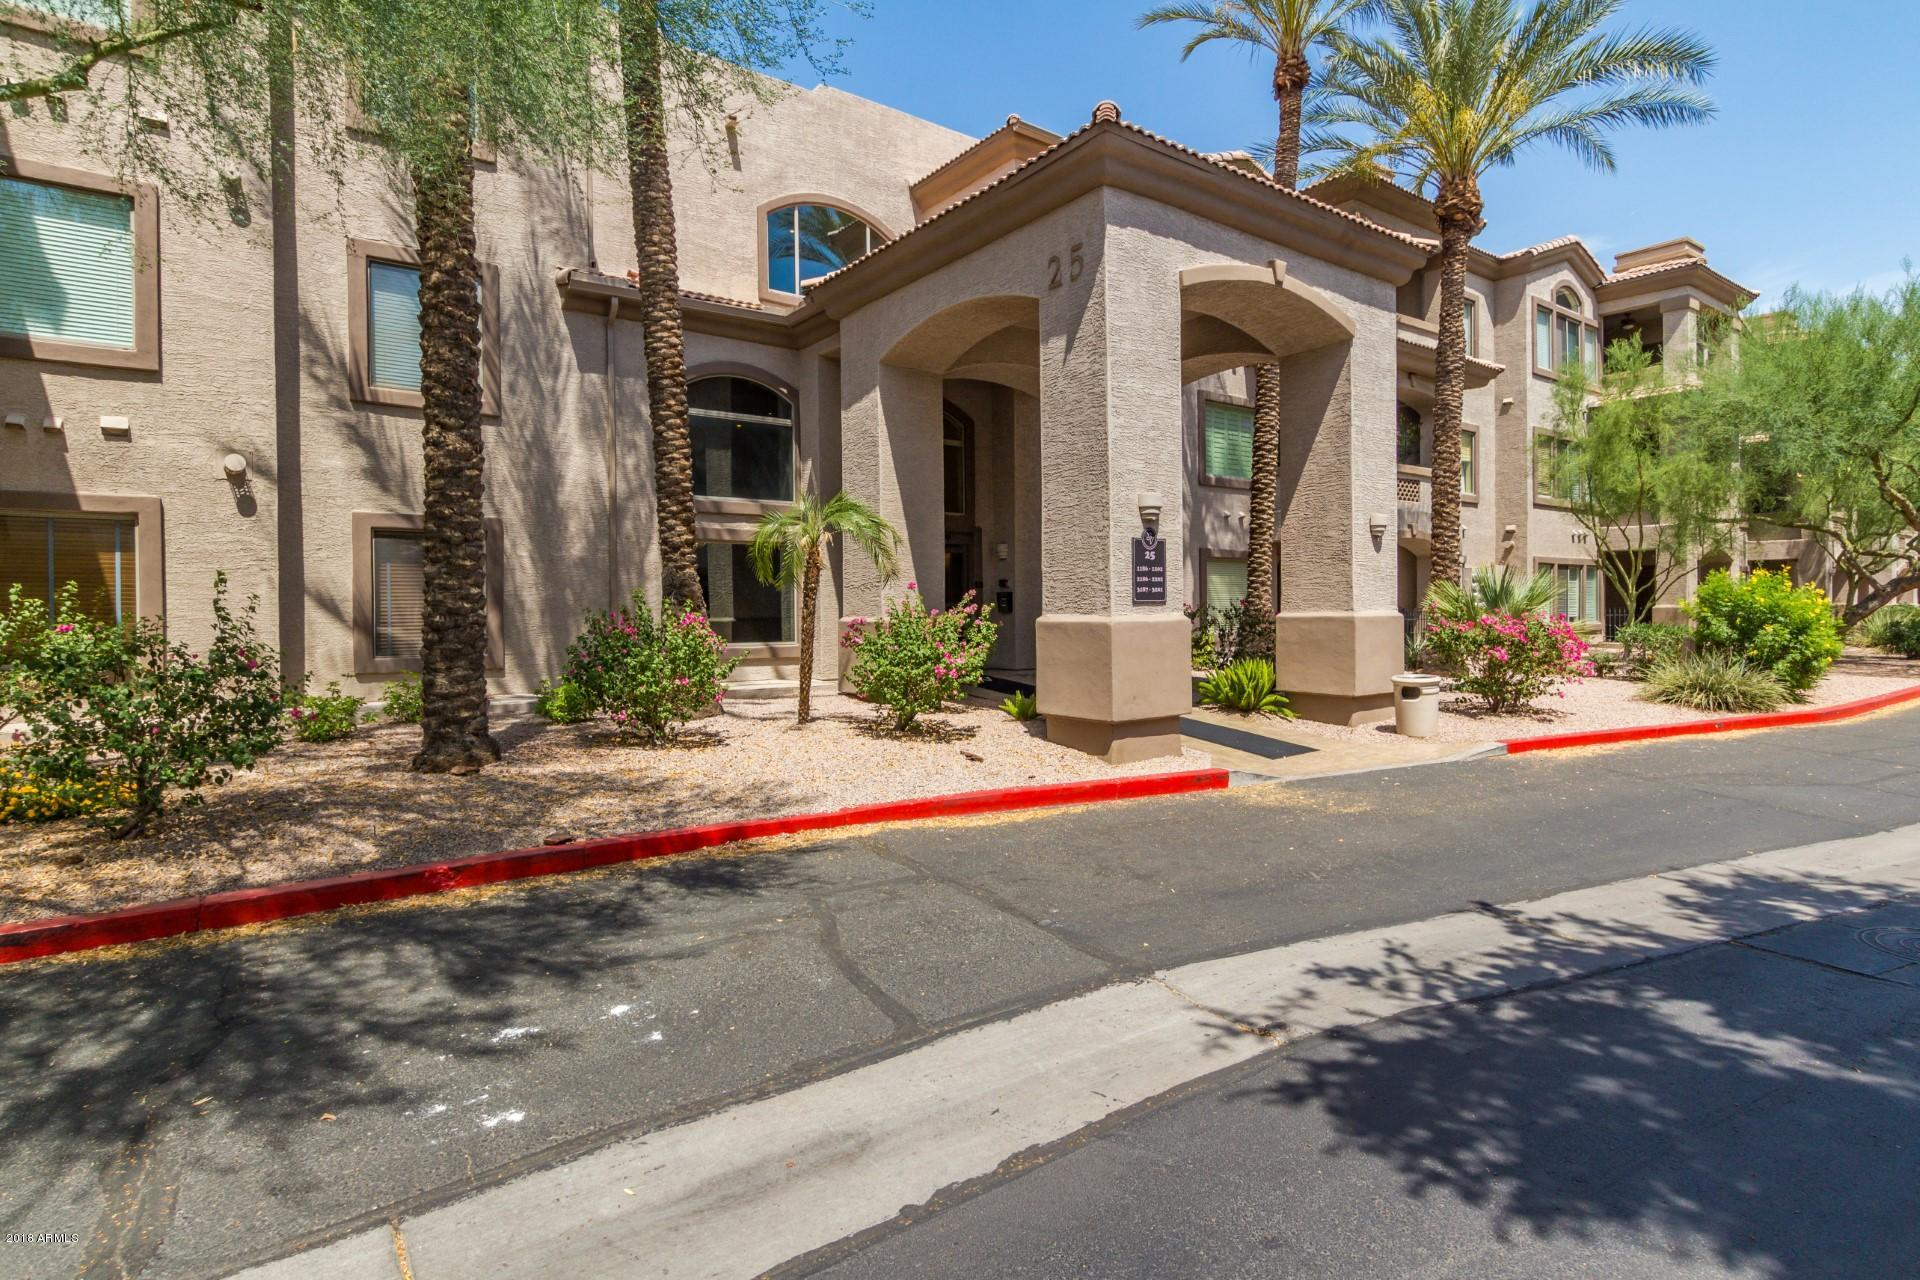 MLS 5799360 14000 N 94TH Street Unit 2190, Scottsdale, AZ 85260 Scottsdale AZ Bella Vista